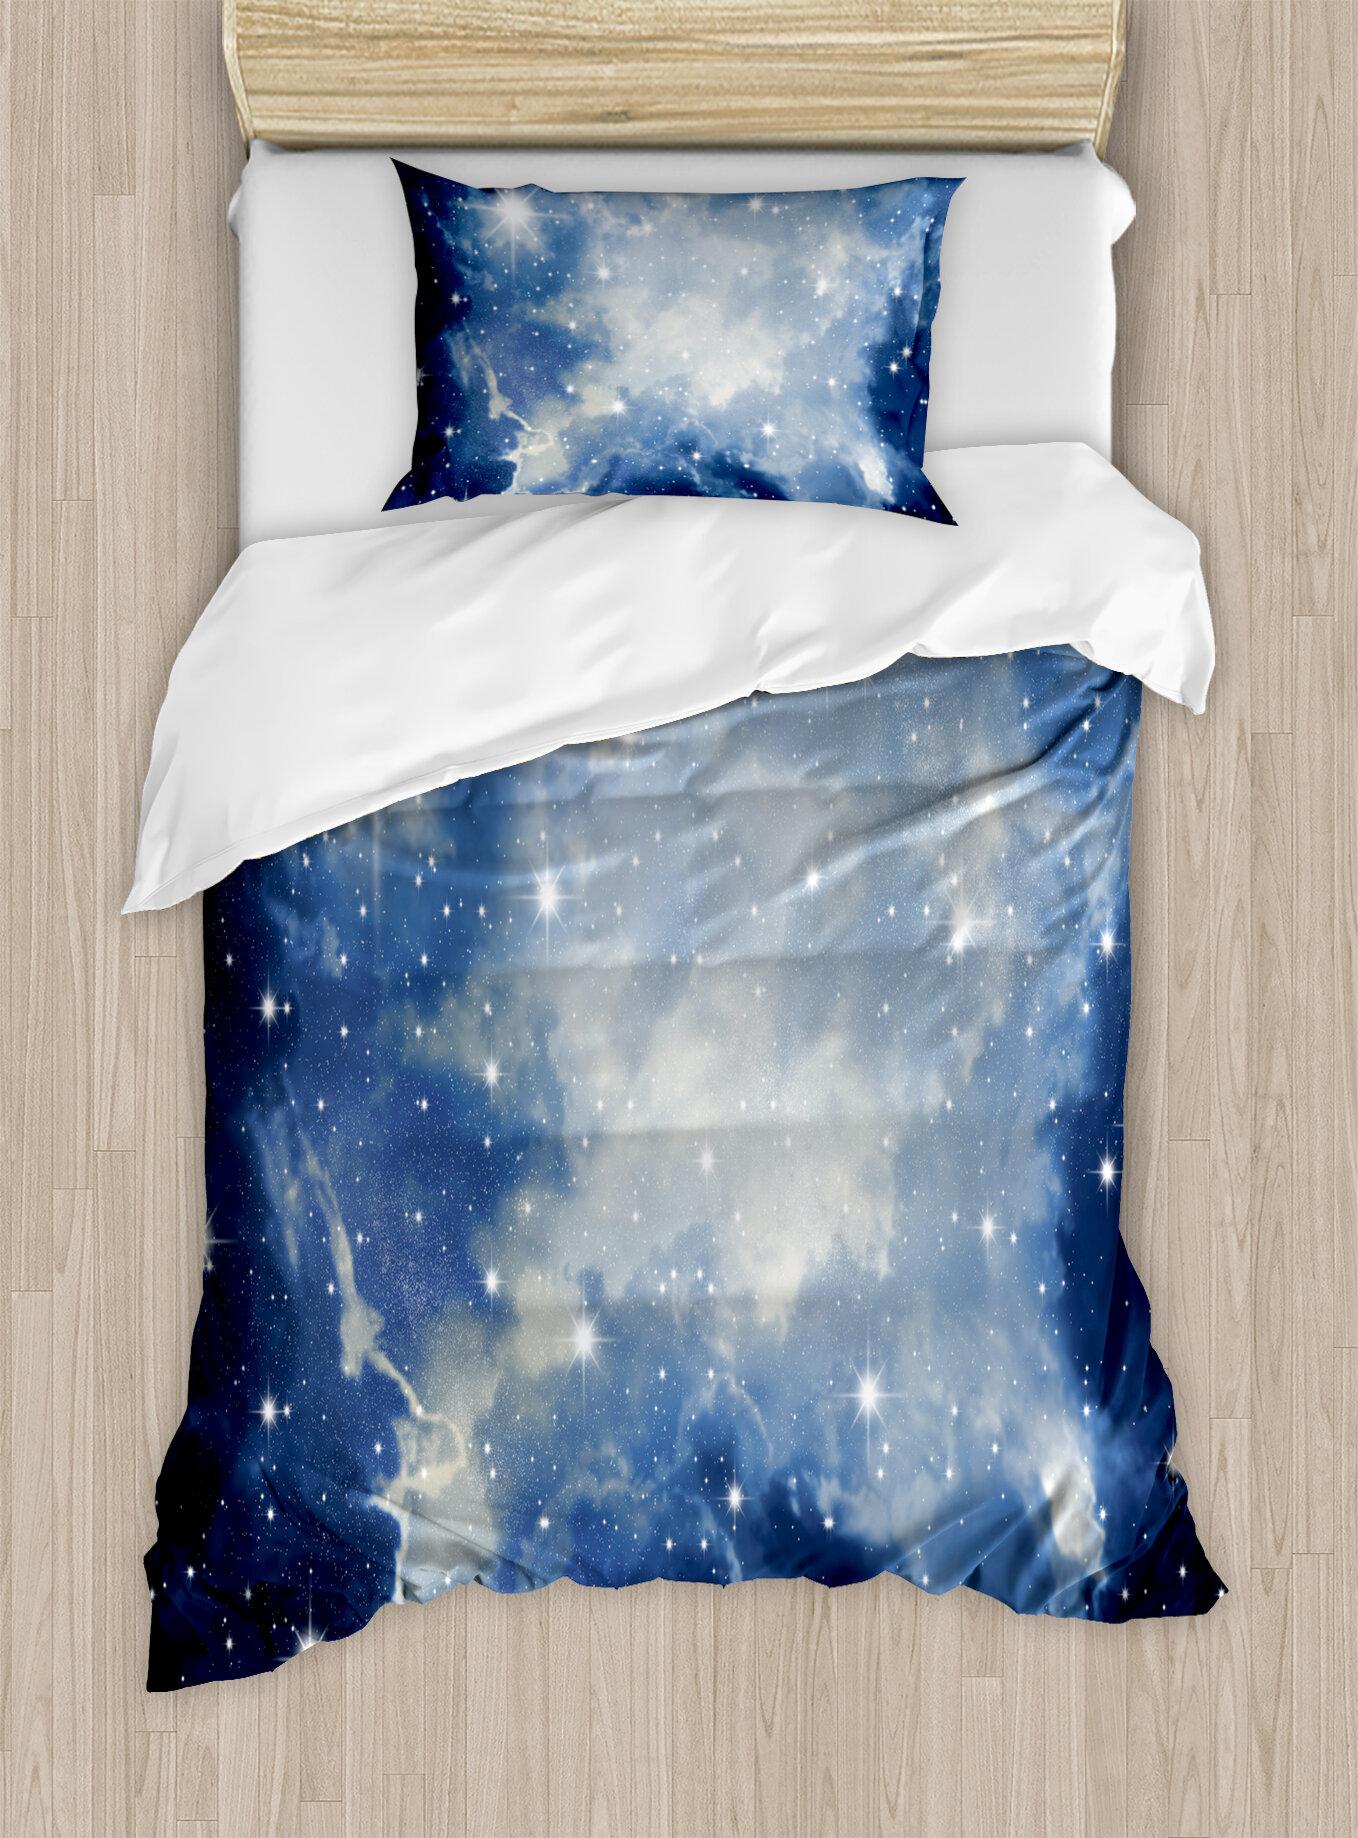 src bedding net purple b queen bedspread cotton tapestry bed x home cloudfront king sears celestial sets prod comforter bath homestead batik